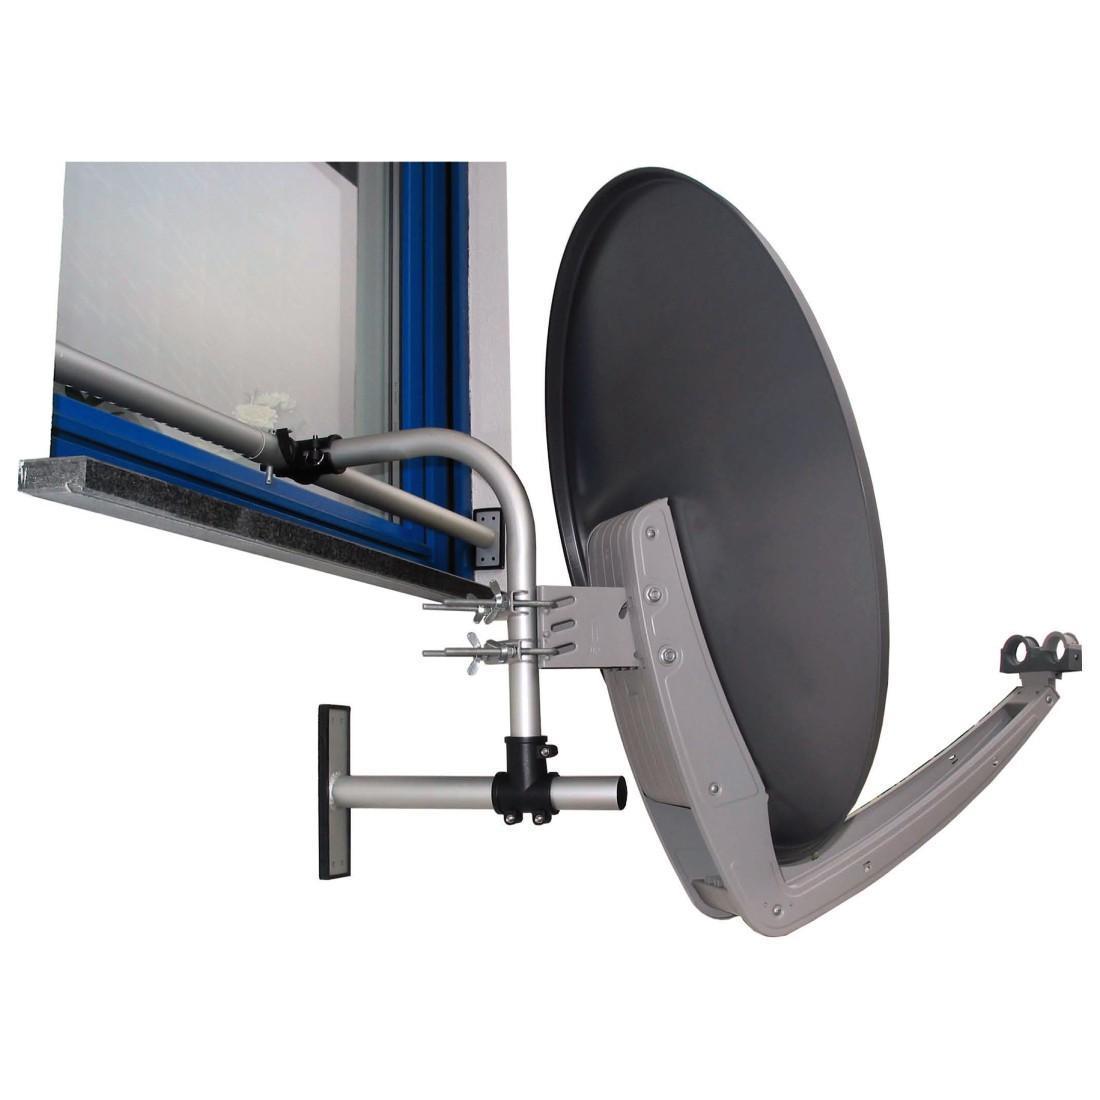 hama fensterhalterung easy mount f r sat spiegel elektronik. Black Bedroom Furniture Sets. Home Design Ideas